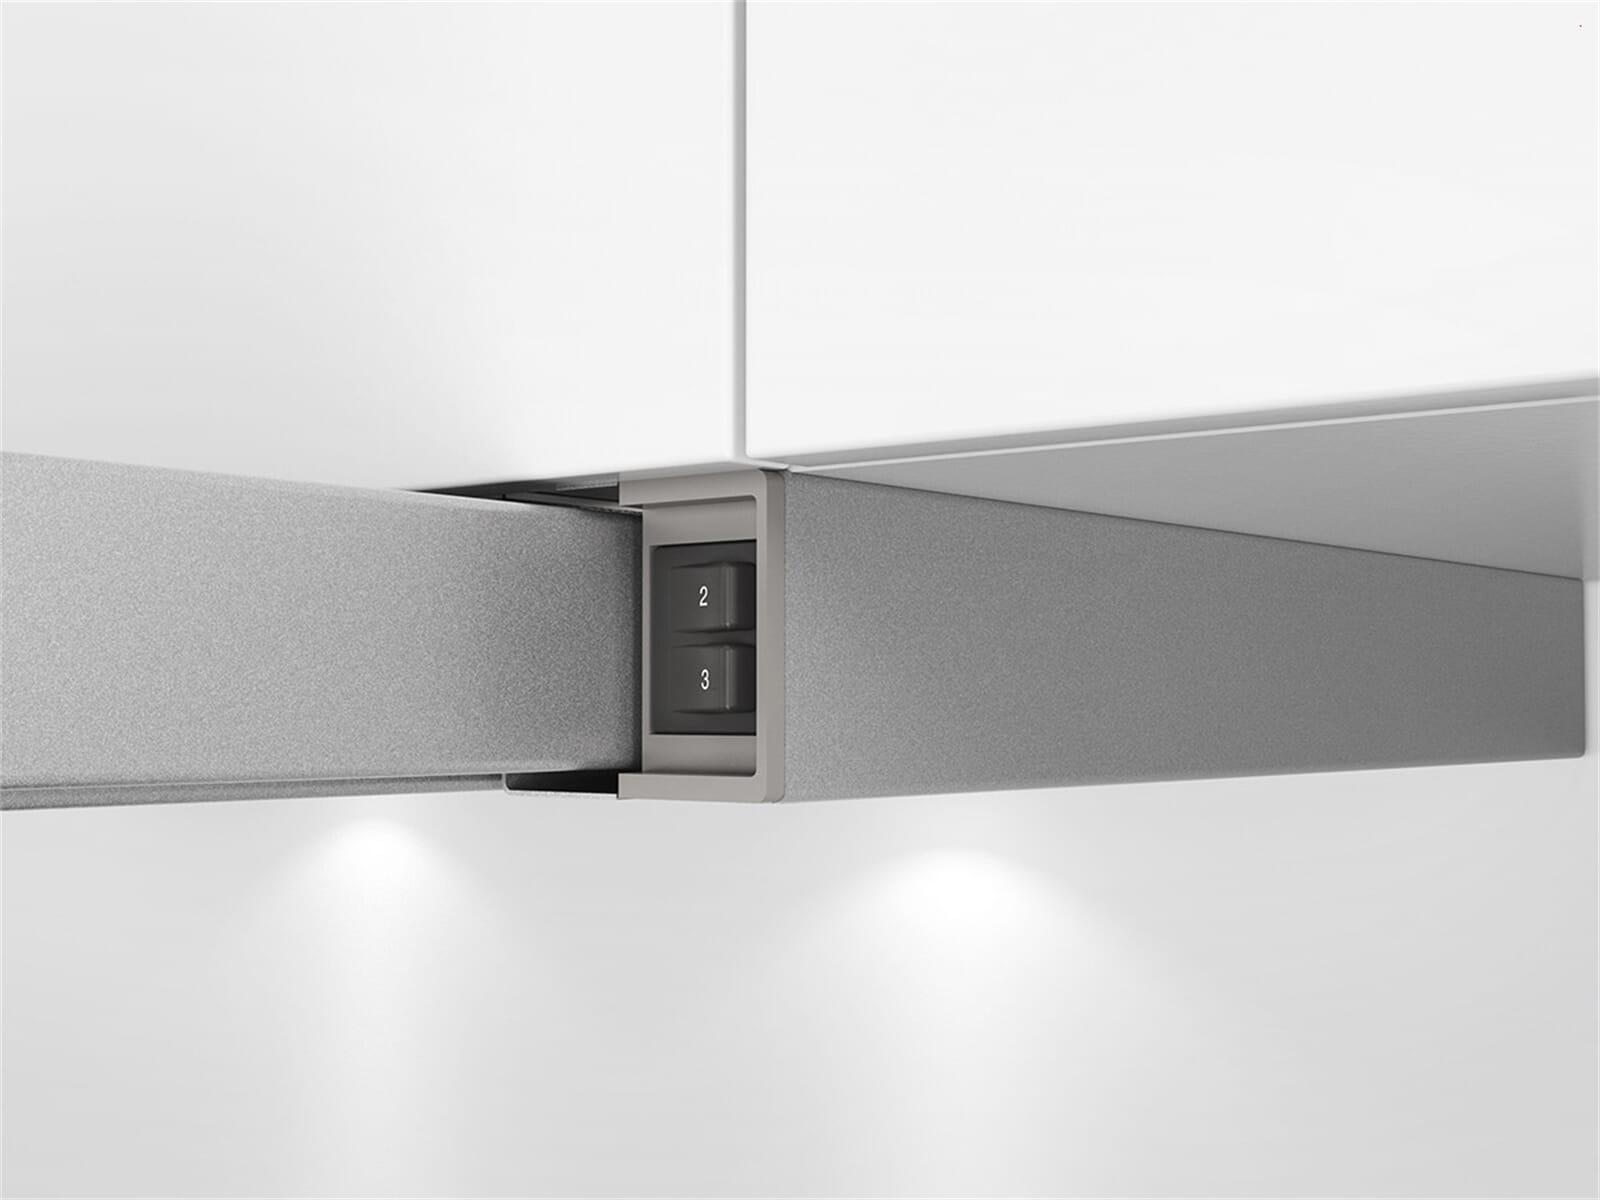 bosch dfl064w50 flachschirmhaube grau metallic ebay. Black Bedroom Furniture Sets. Home Design Ideas